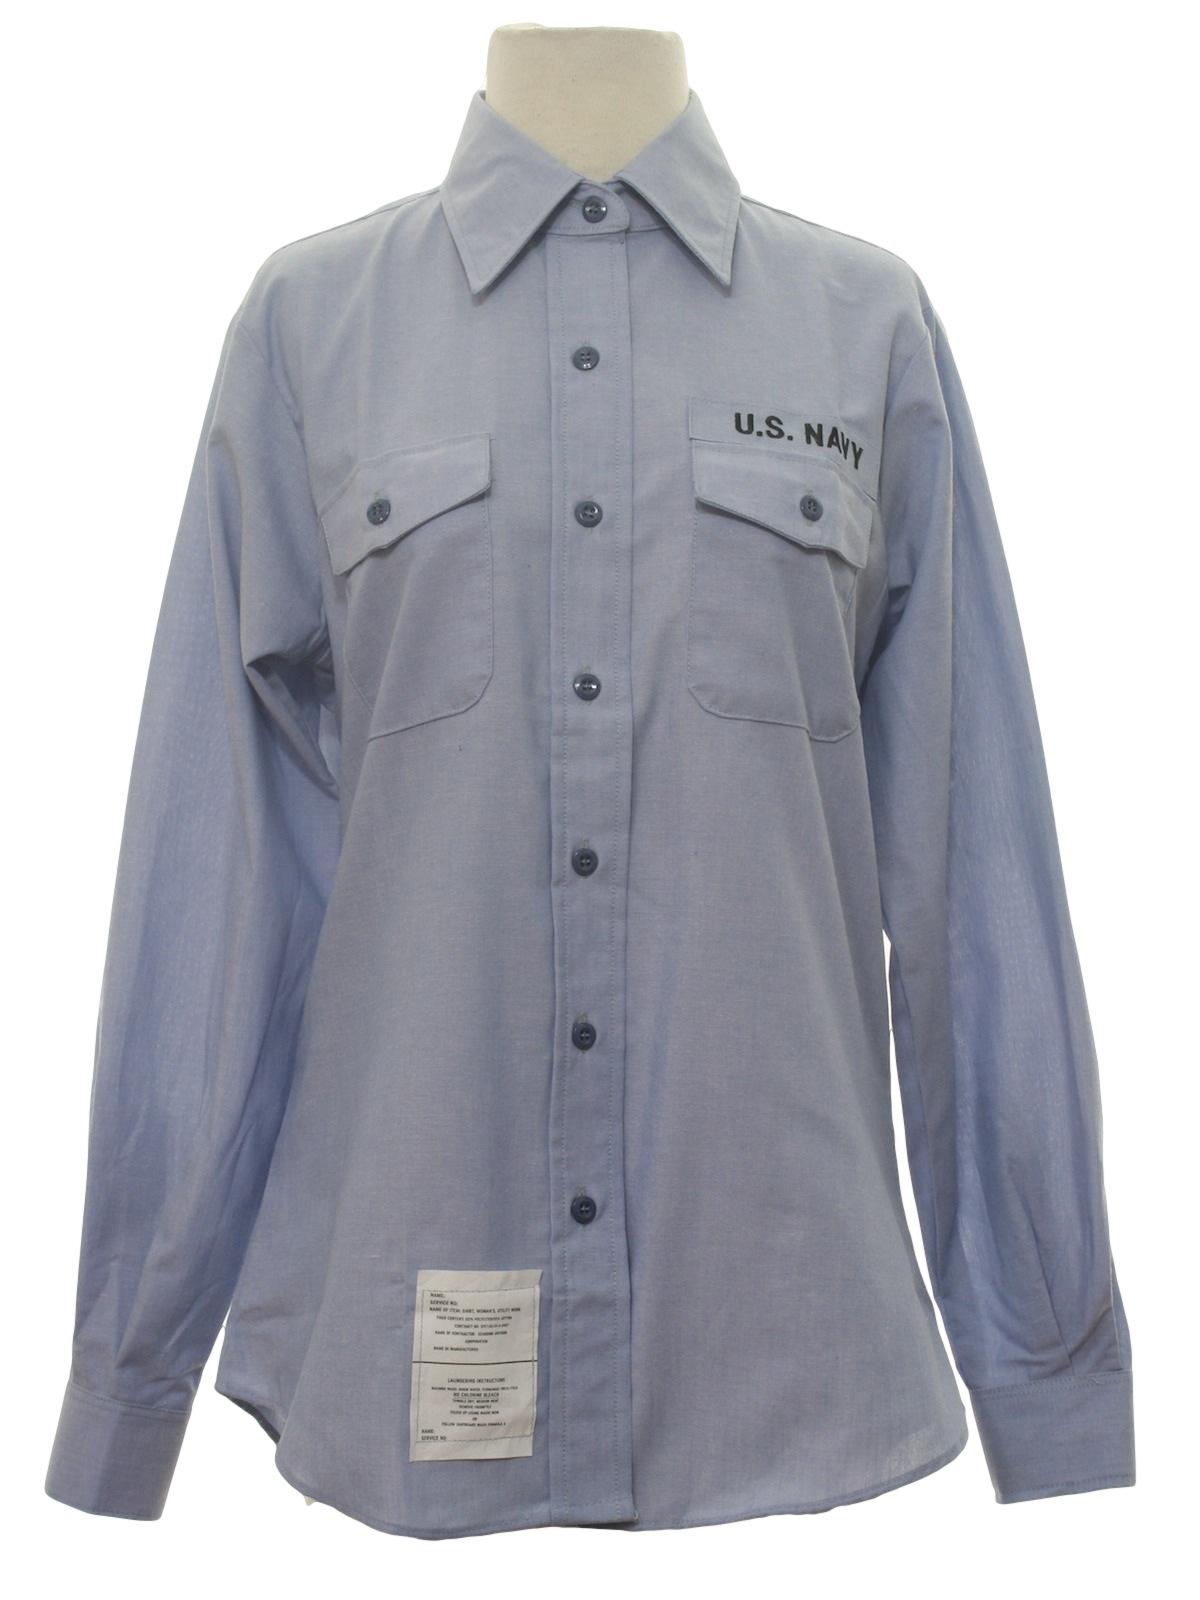 Eighties Vintage Shirt 80s Seagoing Uniform Womens